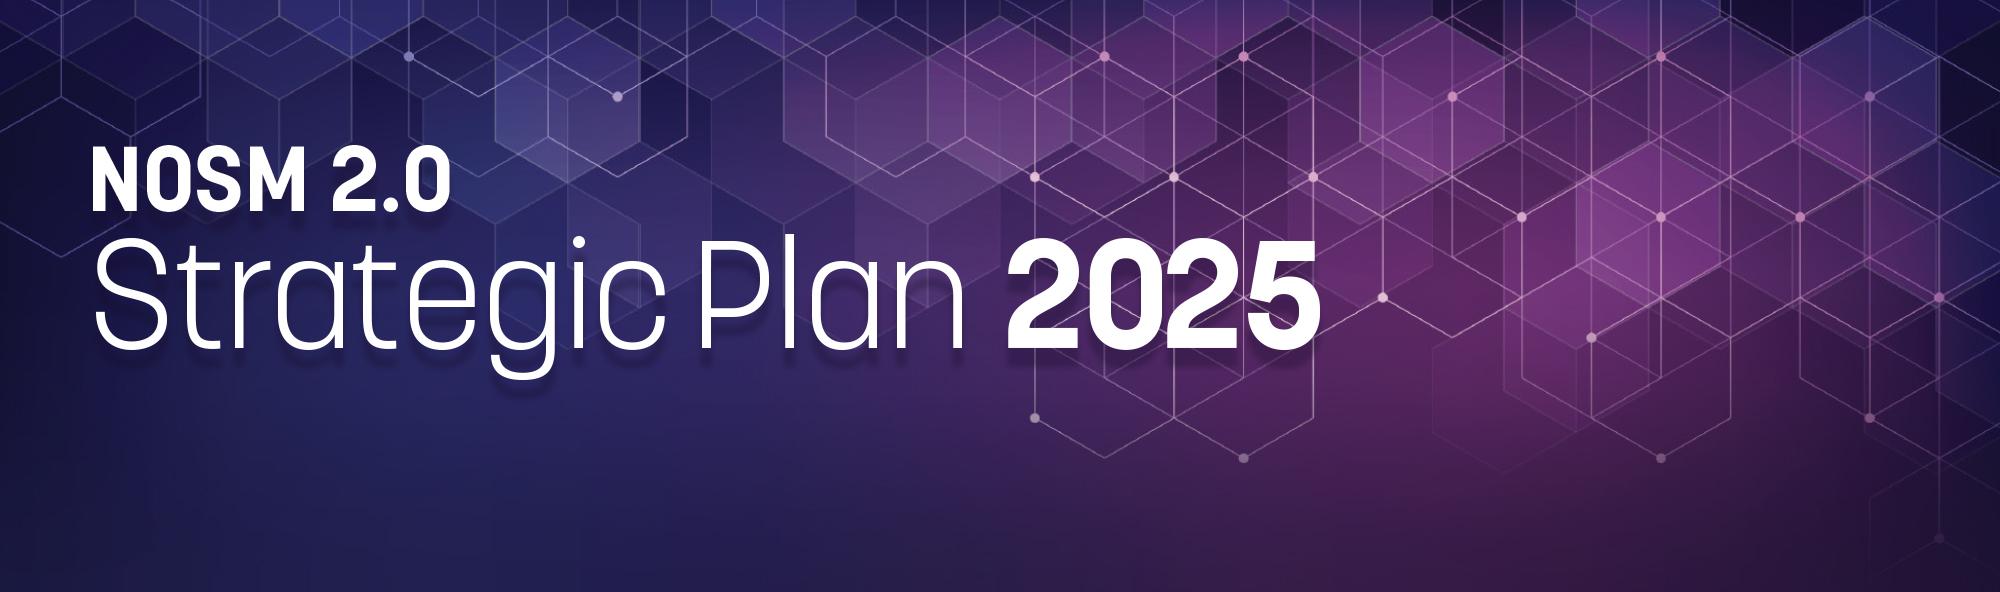 NOSM 2.0 Strategic Plan